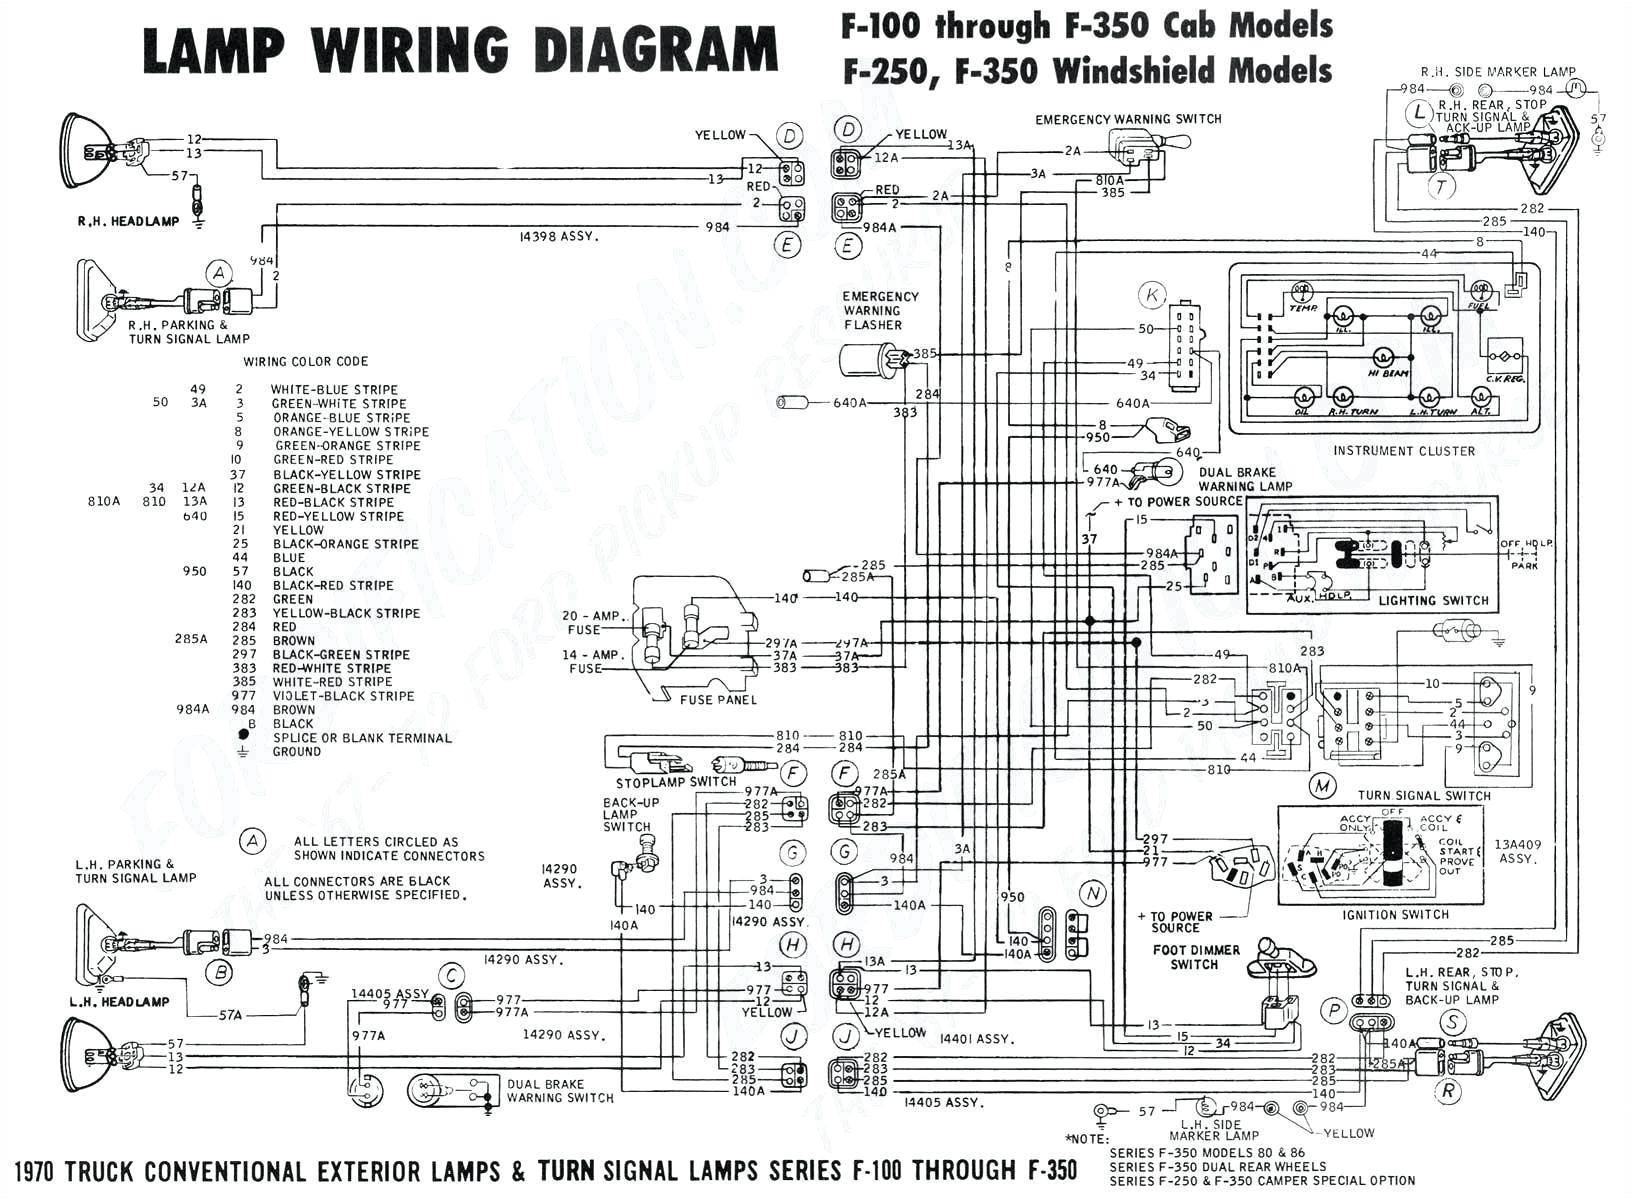 2002 Hyundai Accent Radio Wiring Diagram 1992 Hyundai Wiring Diagram Wiring Diagram Page